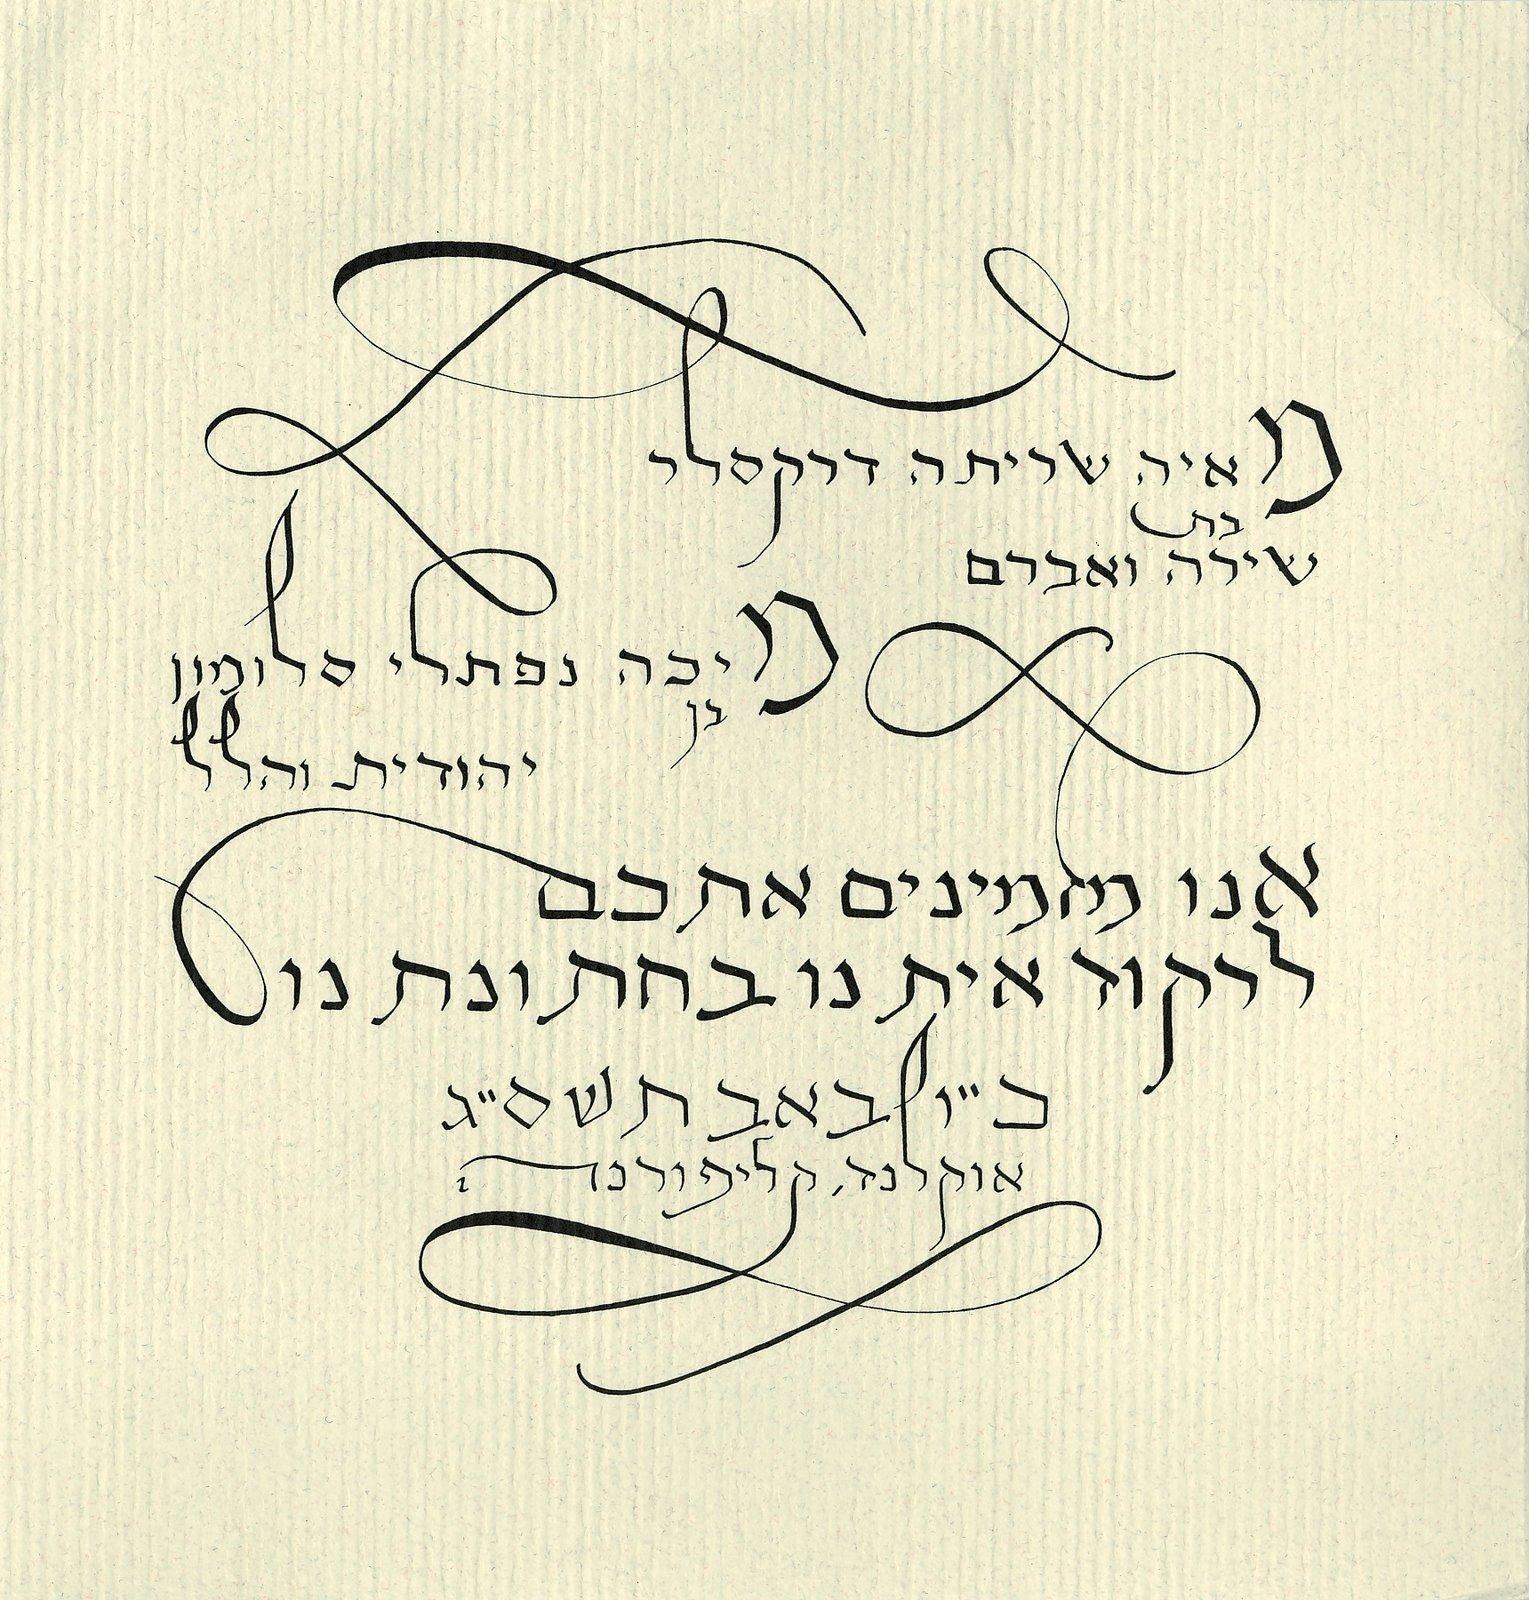 Hebrew Calligraphy